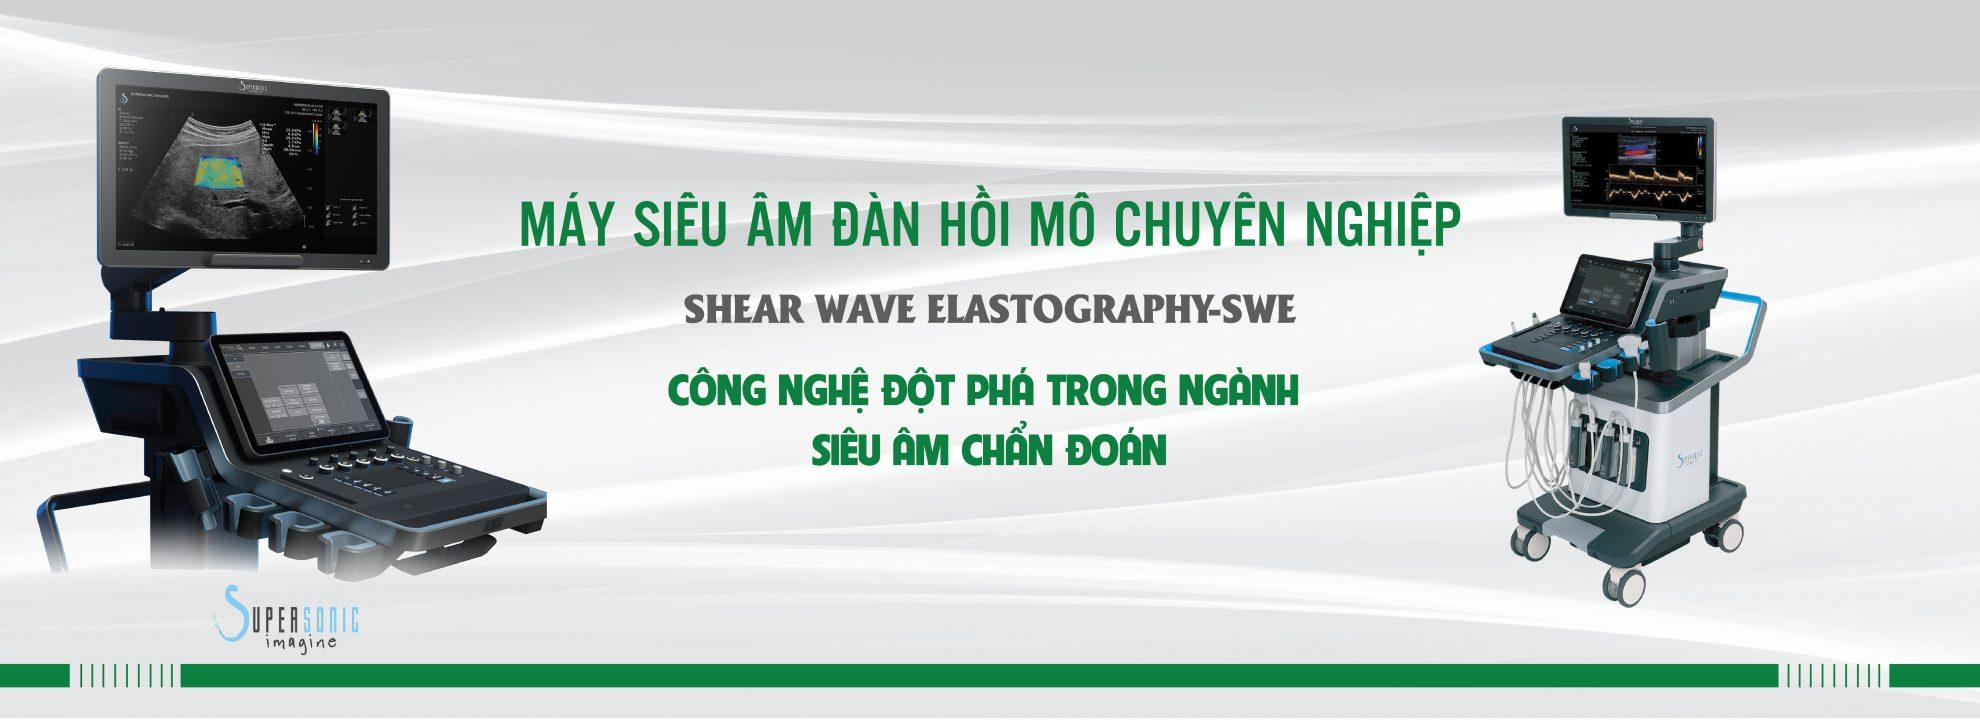 Banner Sieu am dan hoi mo - Cty Nhat Khoa - 1980x720px-01